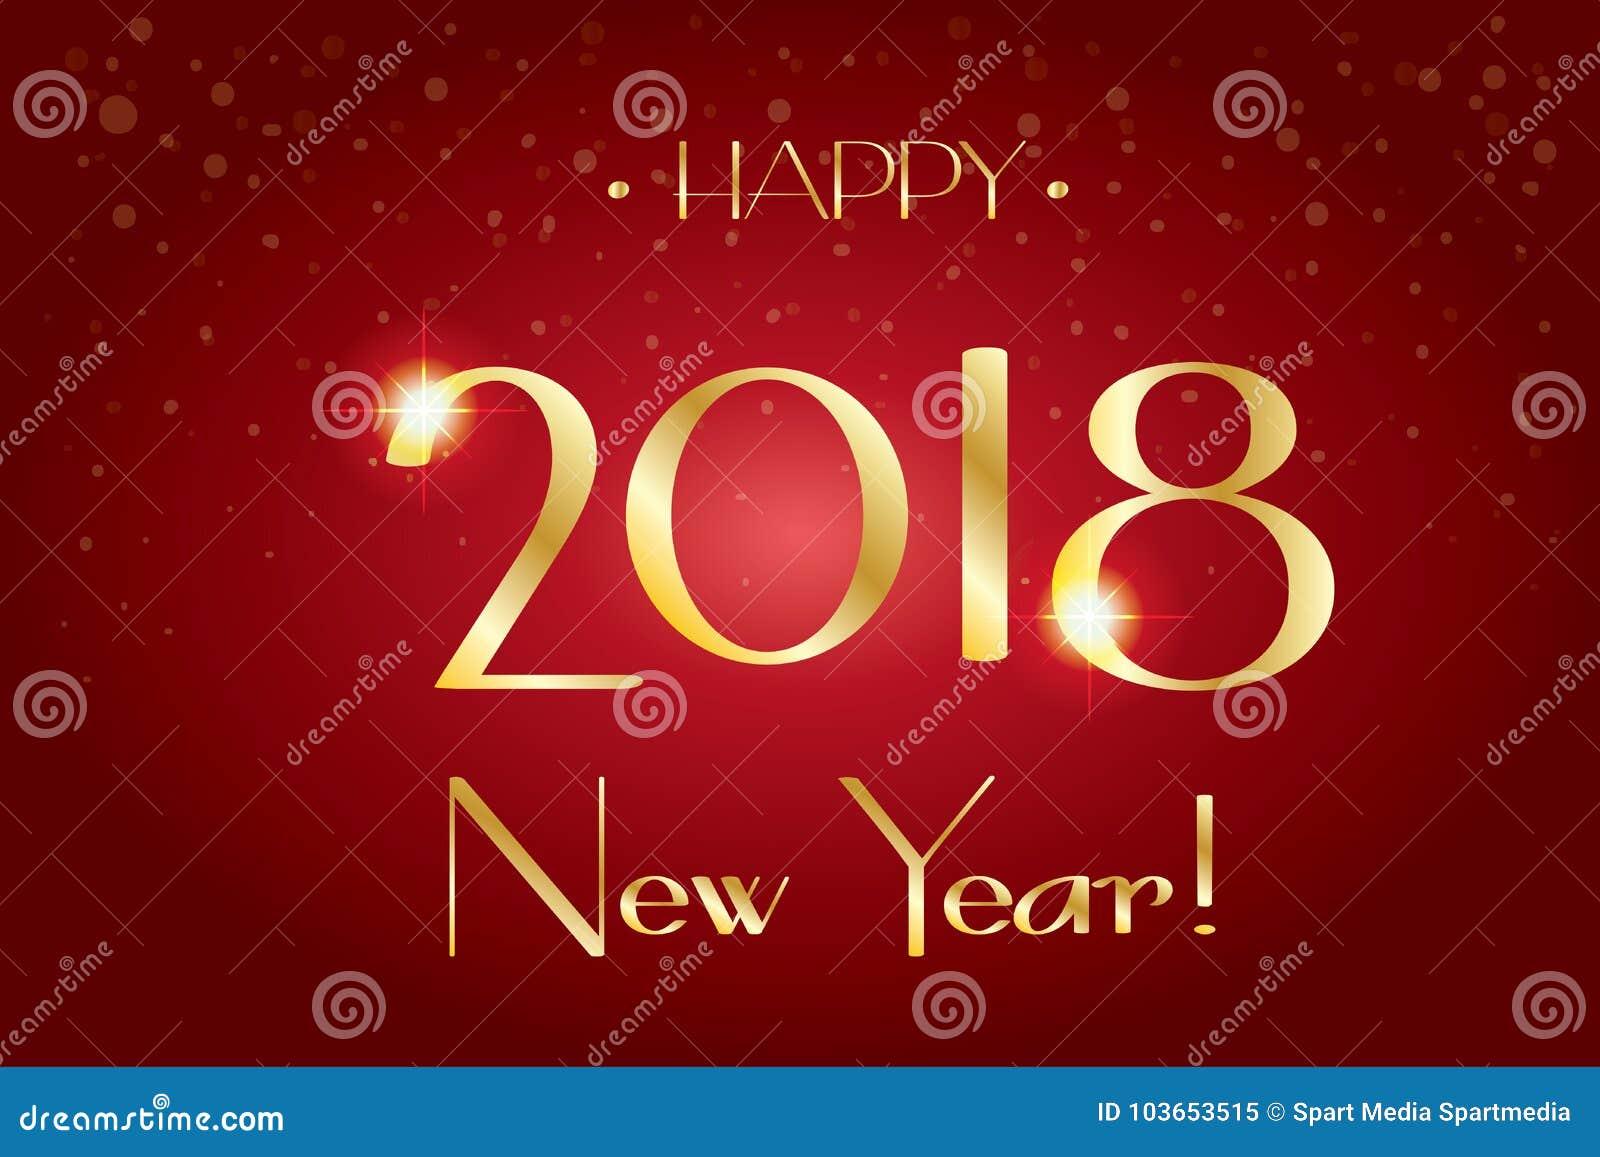 2018 Logo Sign, Happy New Years Wallpaper Stock Vector